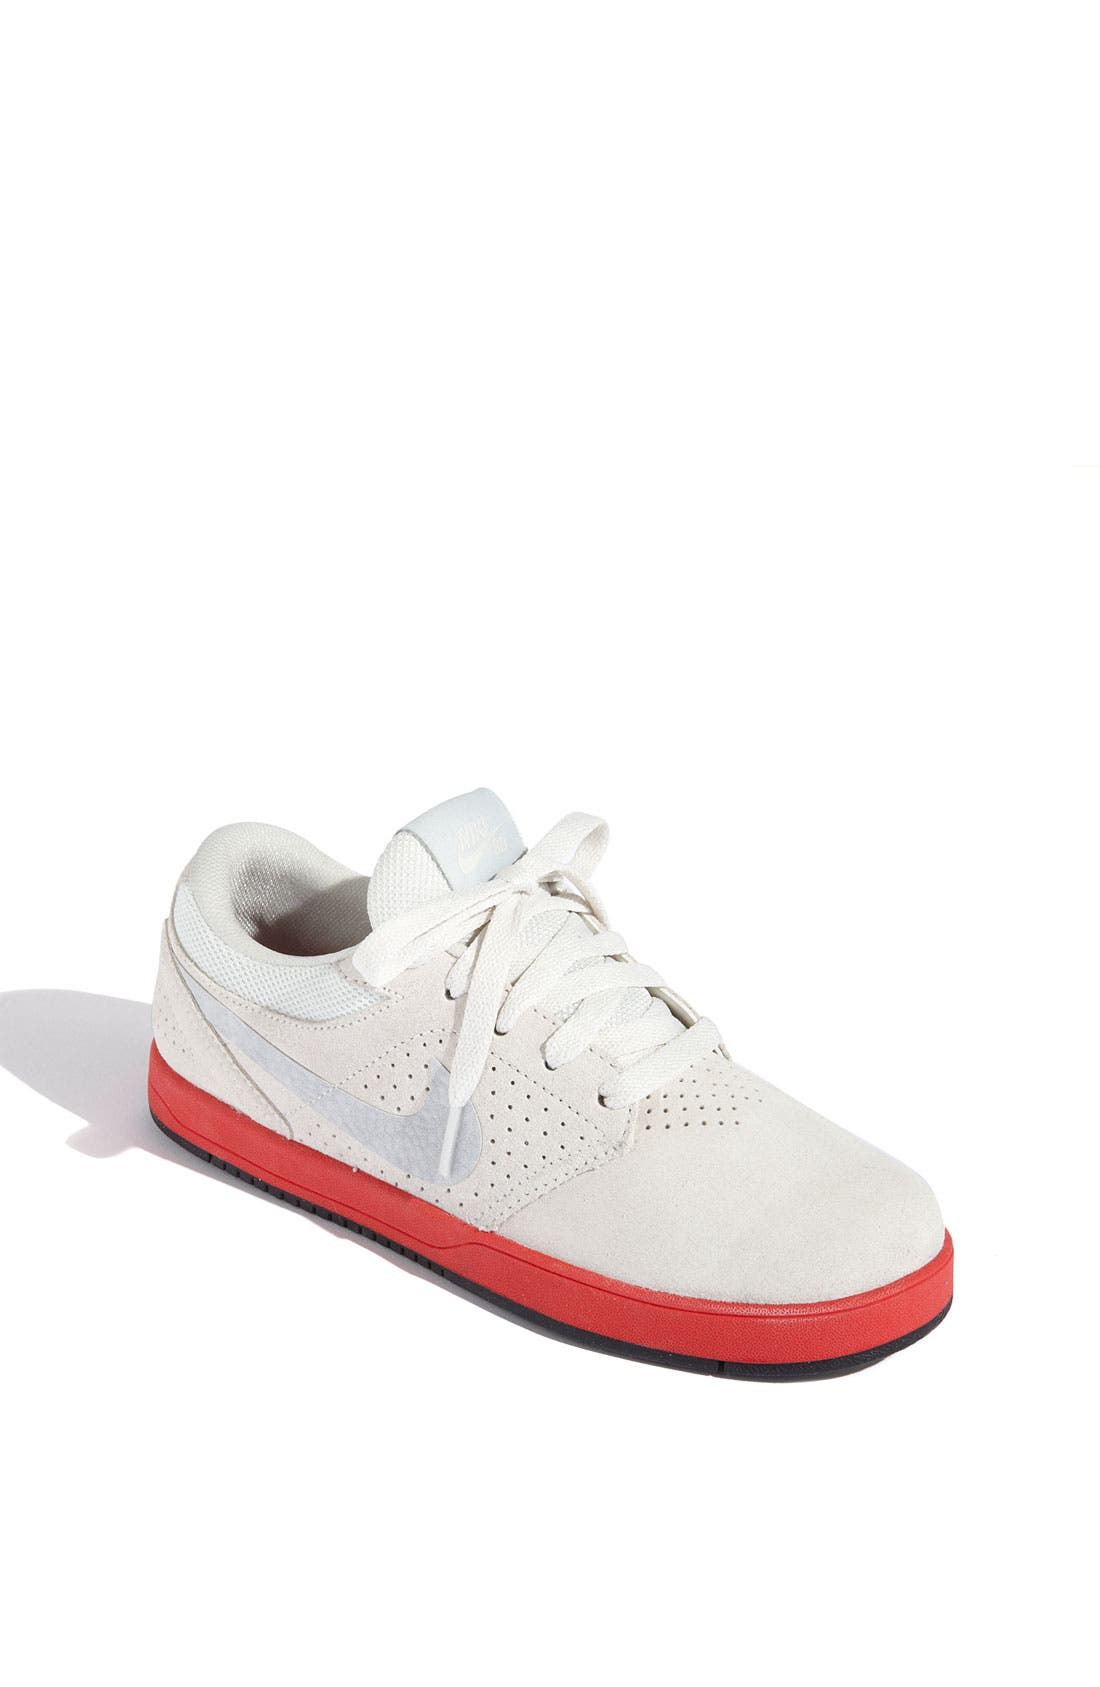 Alternate Image 1 Selected - Nike 'Paul Rodriguez 5' Skate Shoe (Little Kid & Big Kid)